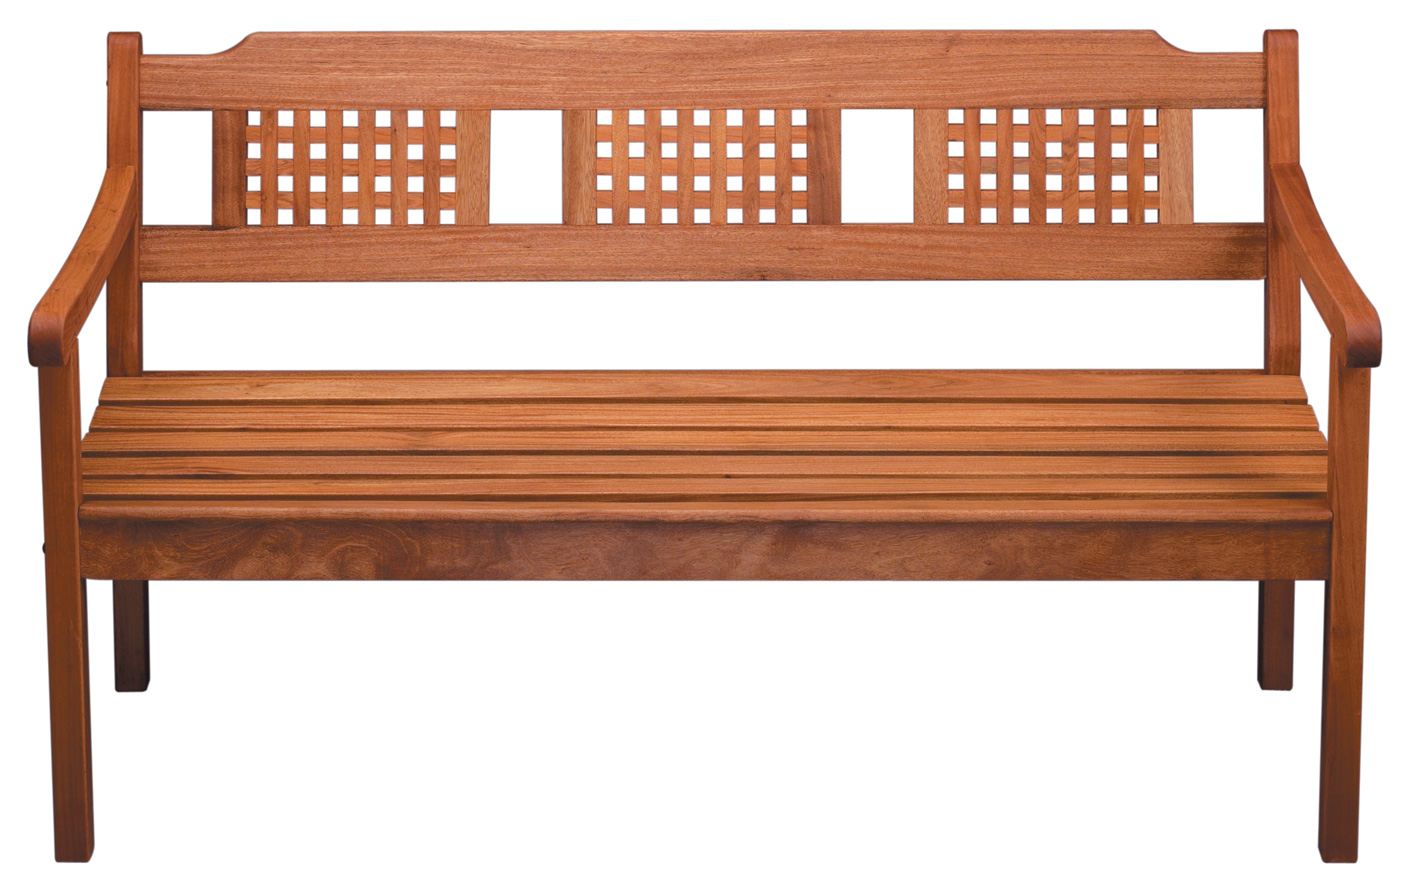 veranda chair design hanging aliexpress outdoor wood furniture from creative woodwork